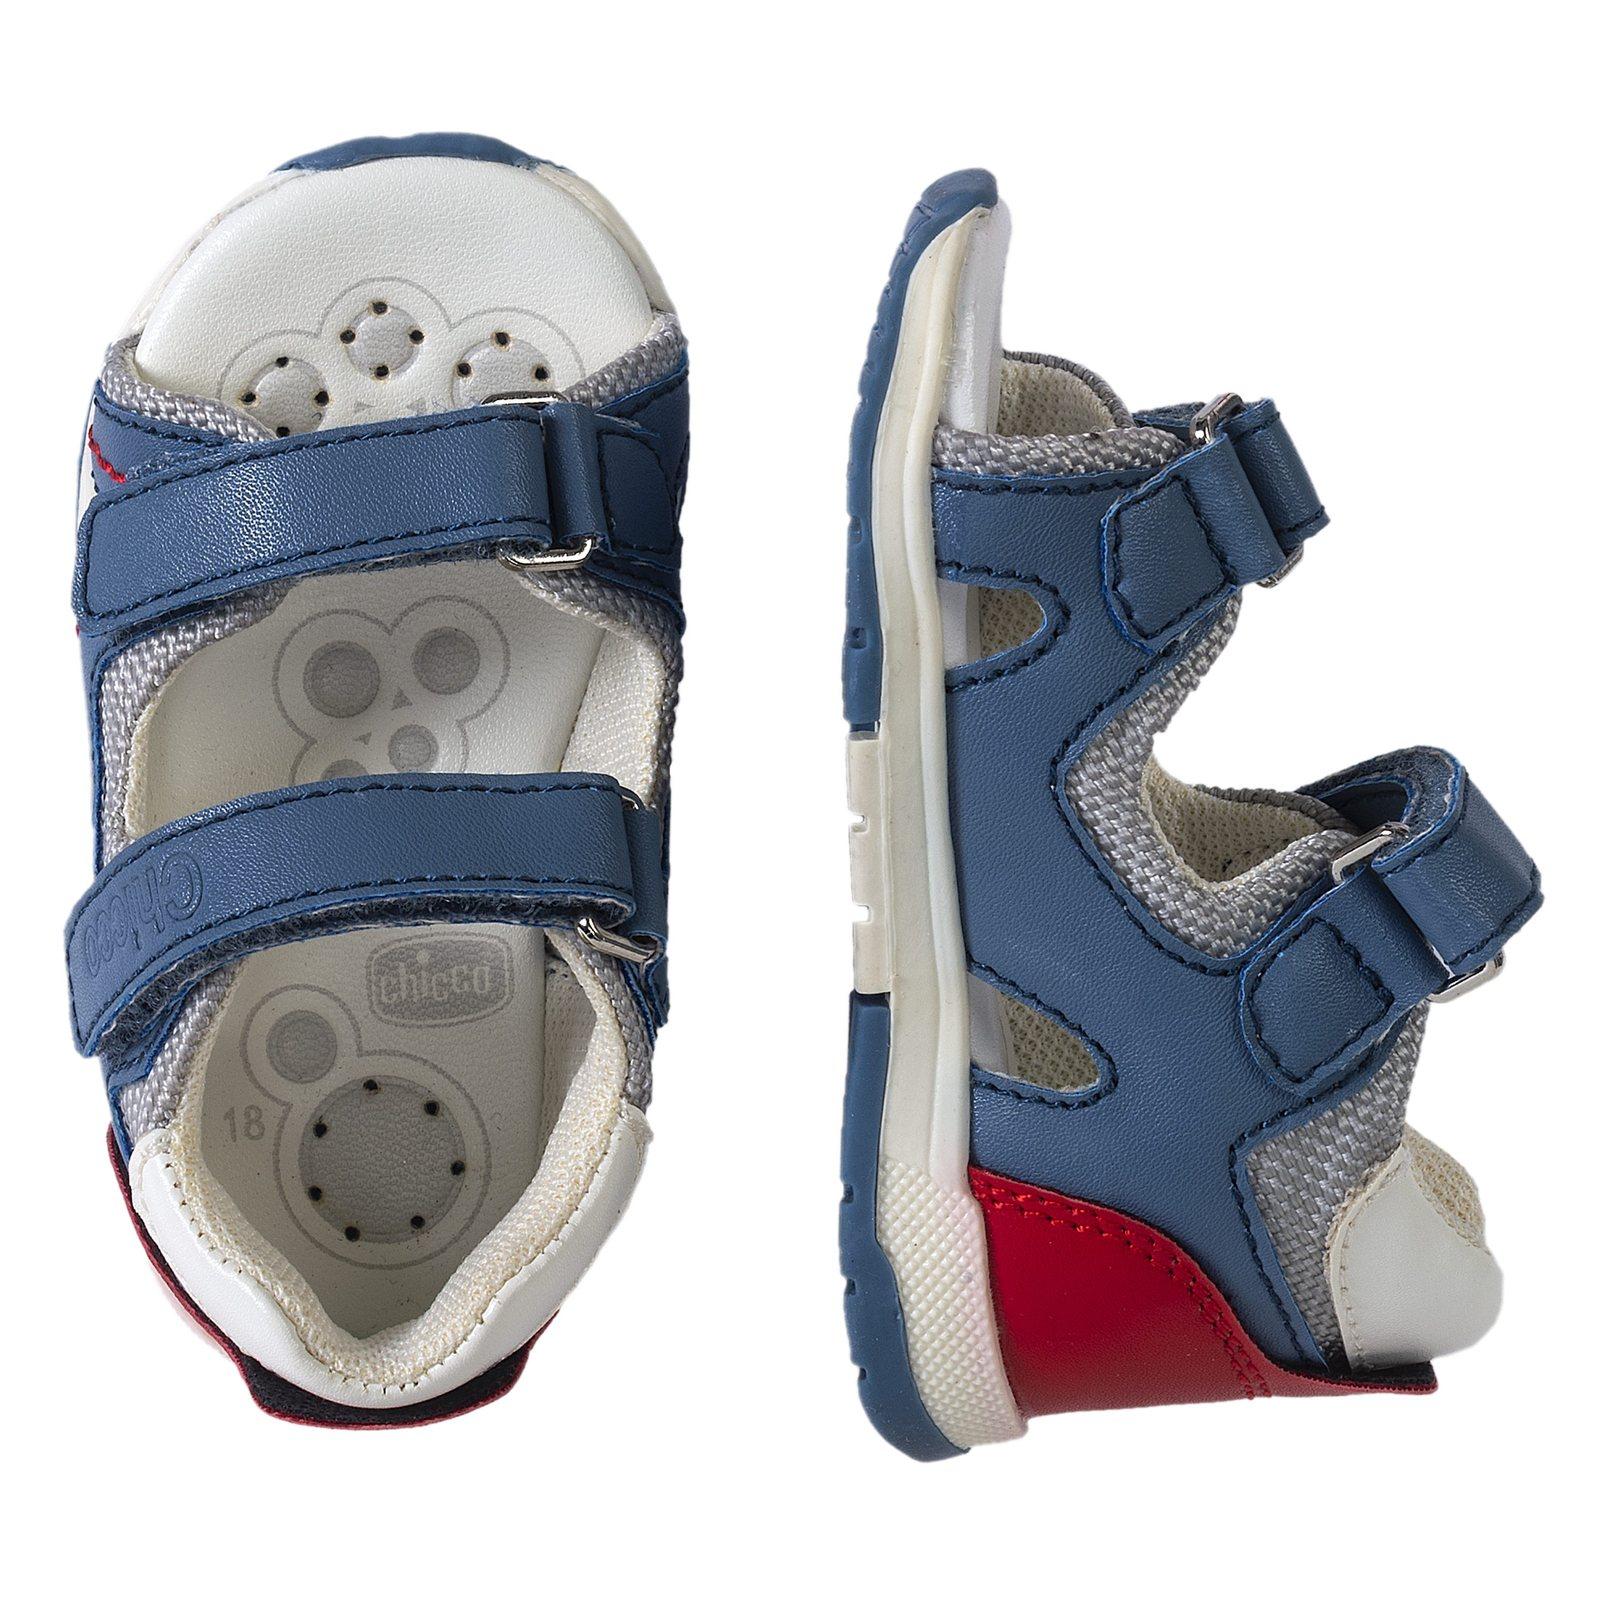 Sandalo Online Gerardo Jeansacquista Su Bambino Chicco Shop Zmqvpusg 8nP0wkXO